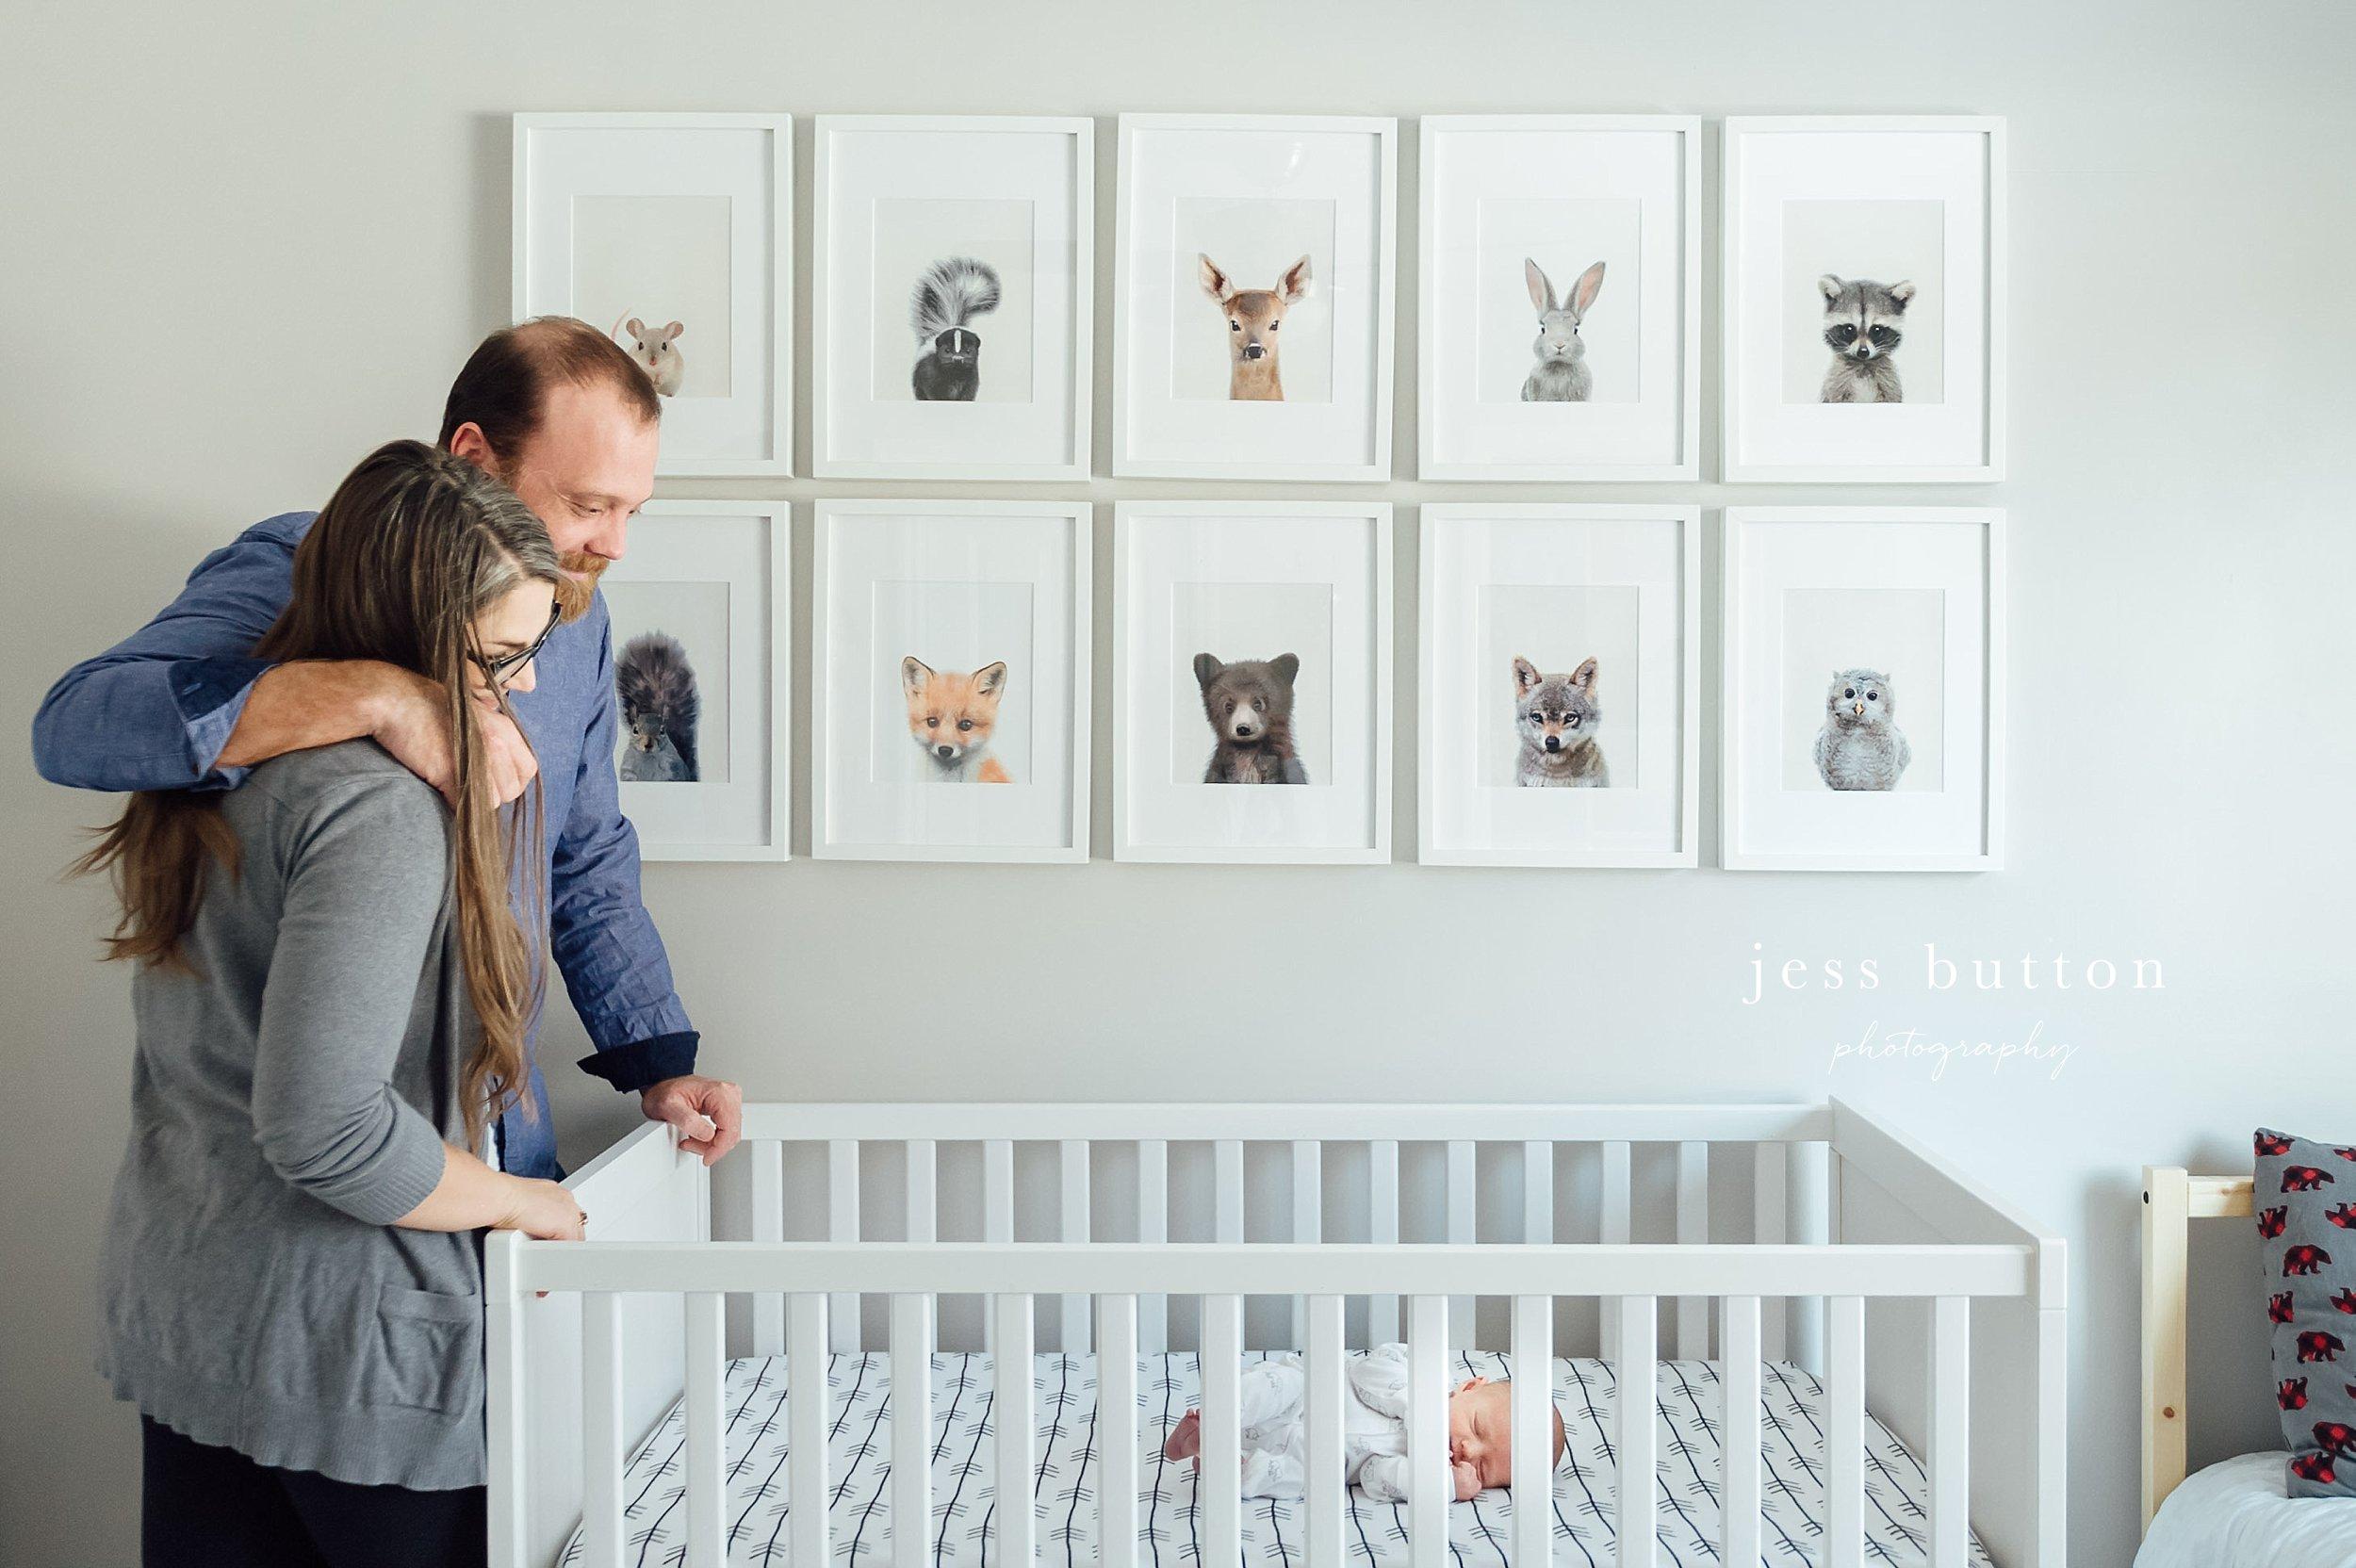 parents looking at newborn in crib - Niagara baby photographer